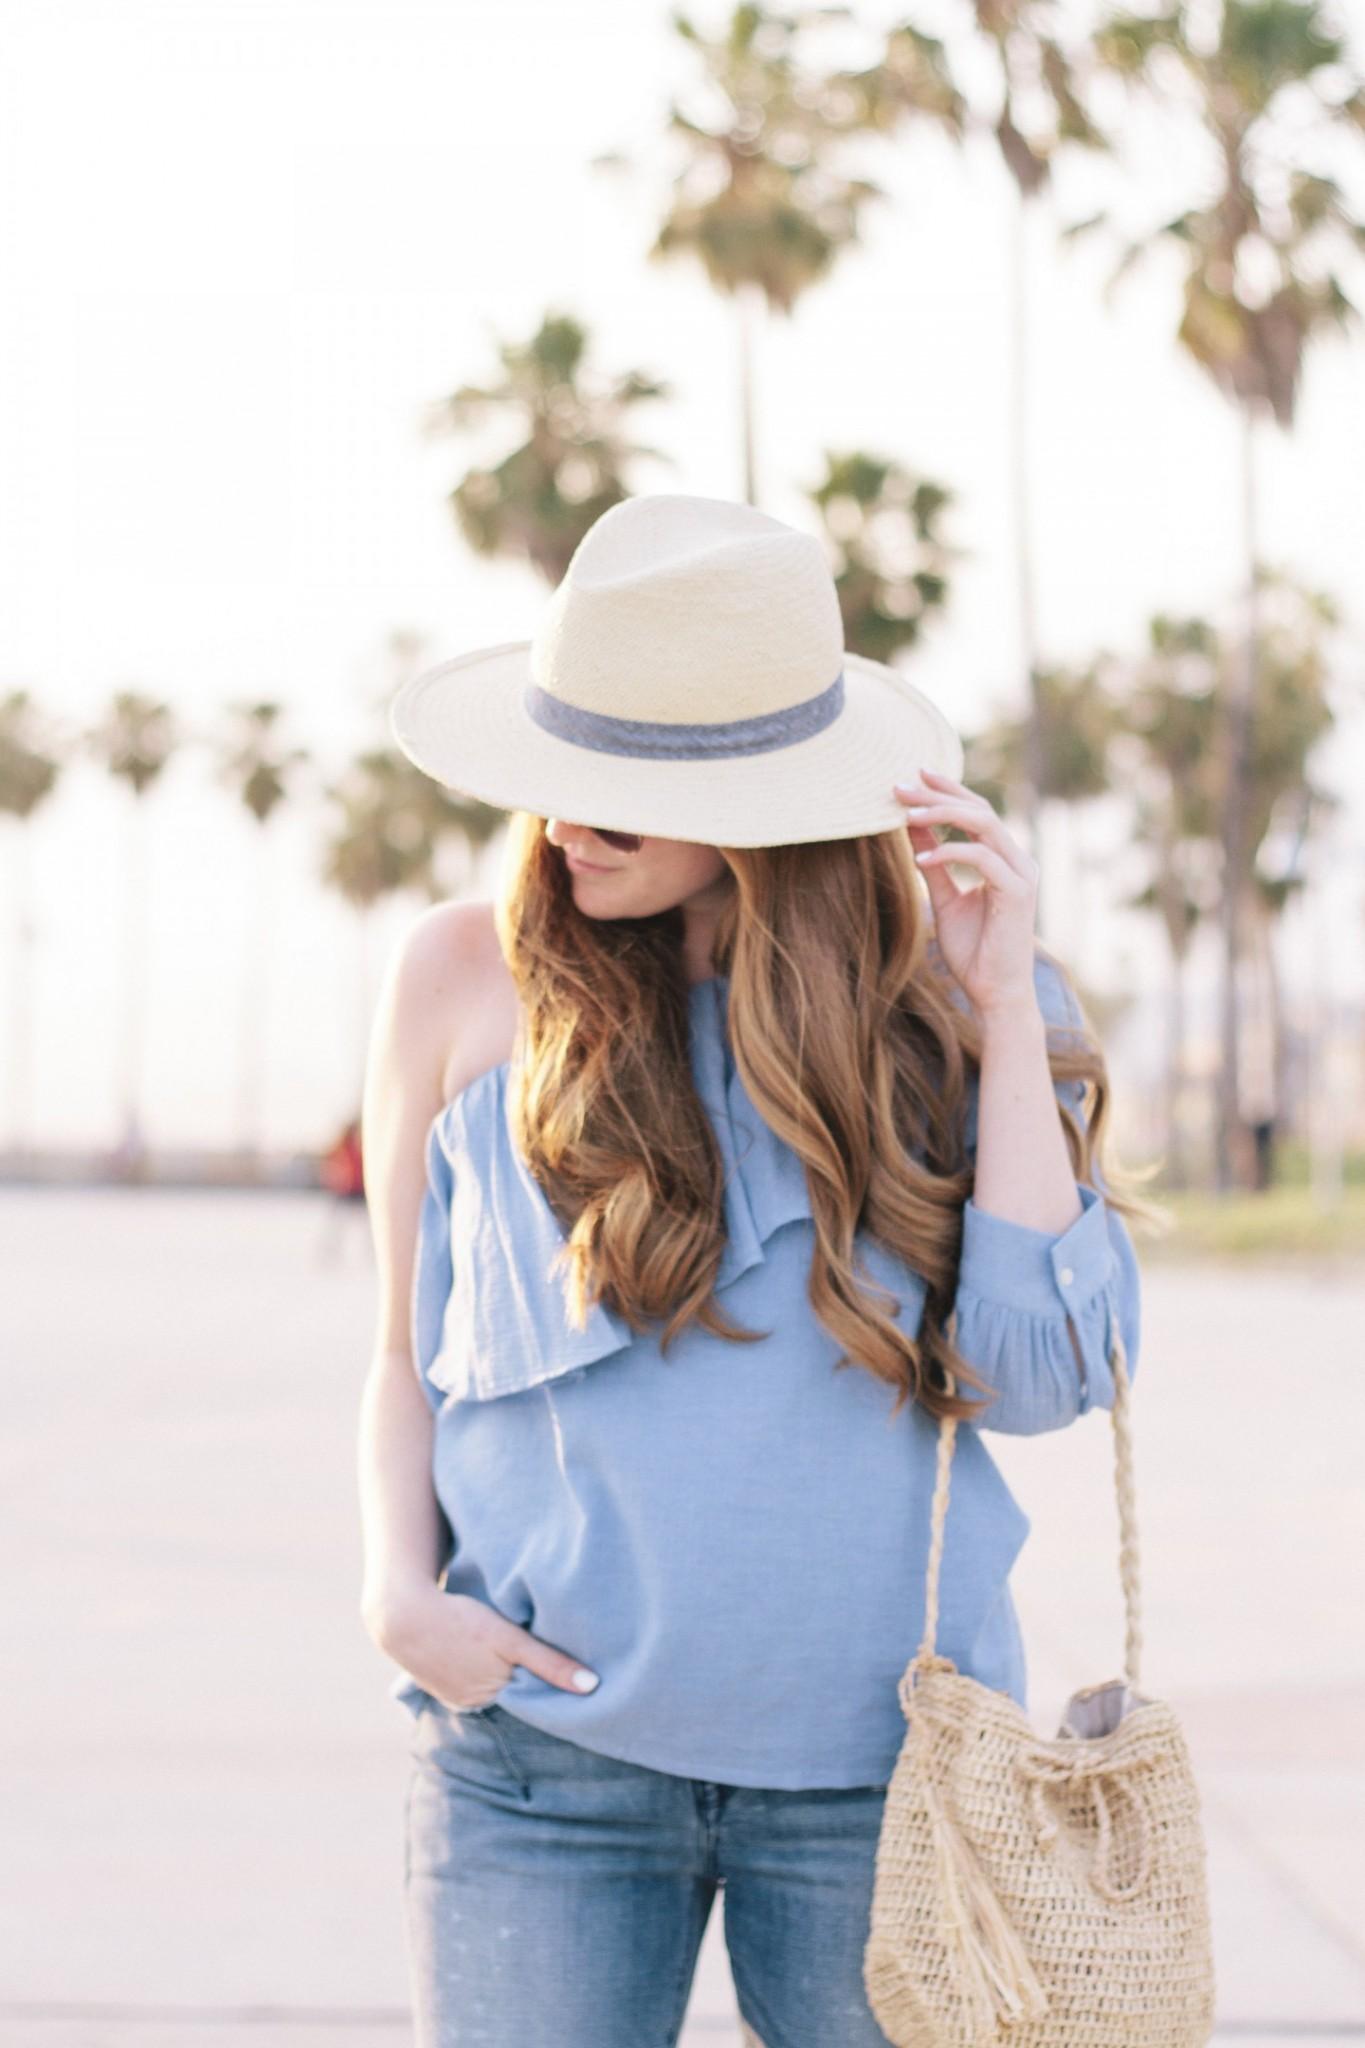 Lifestyle blogger Mollie Sheperdson shares a look in Venice Beach, California